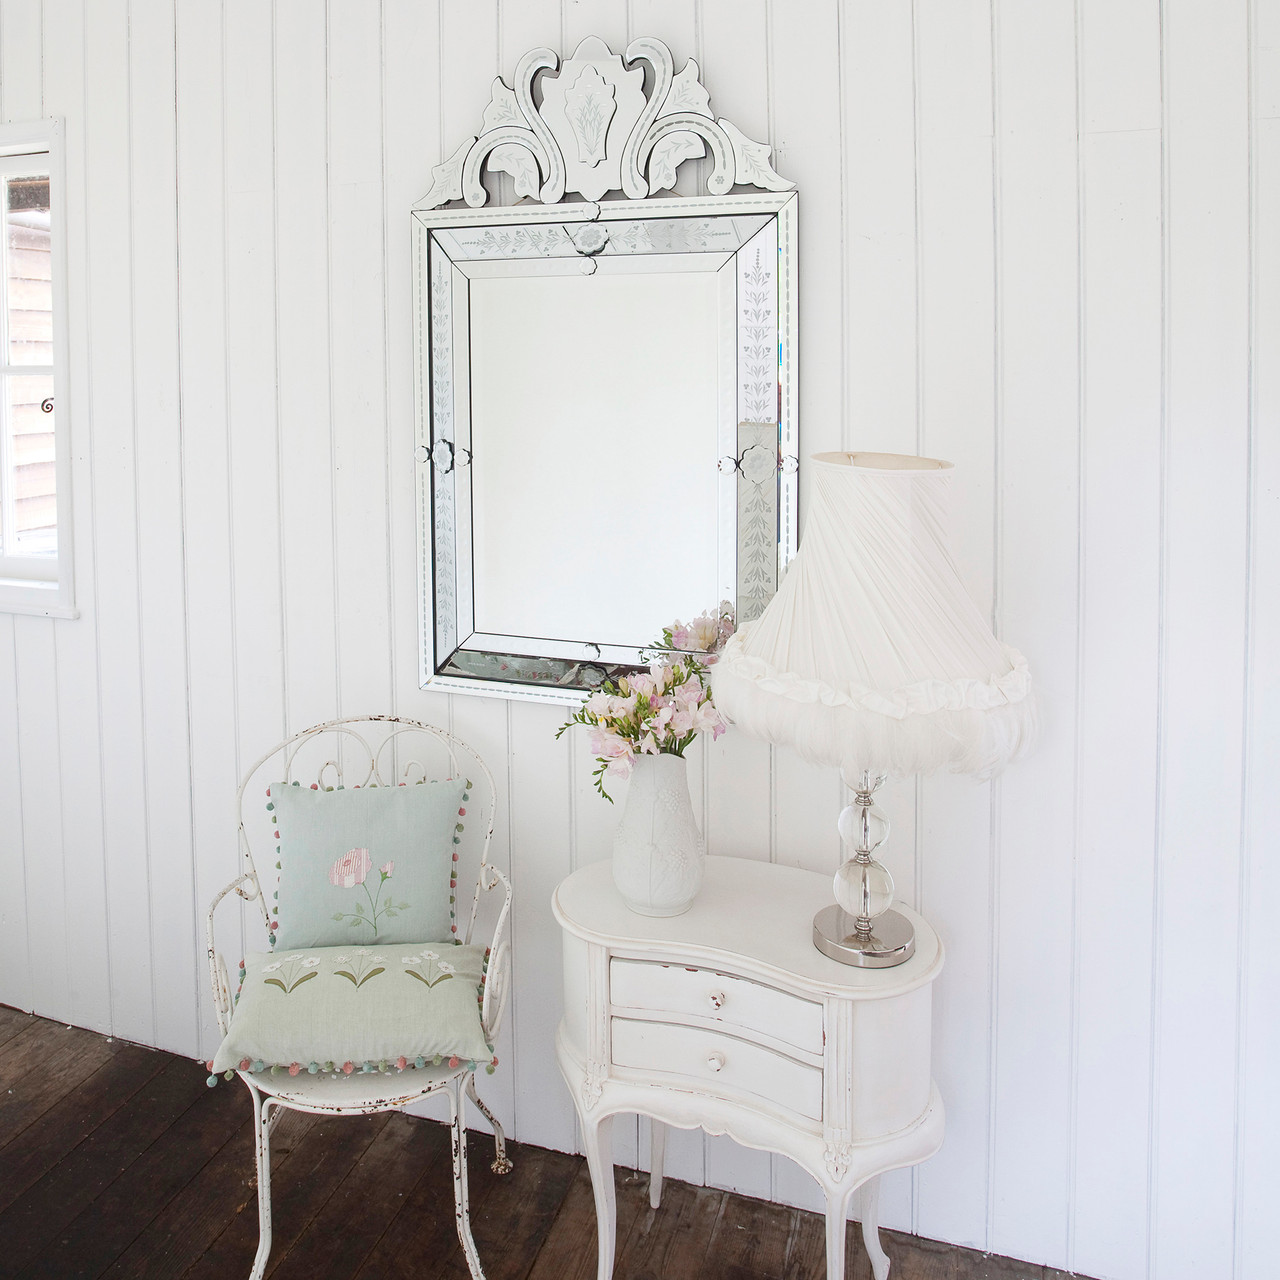 Image of Embellished Venetian Style Mirror